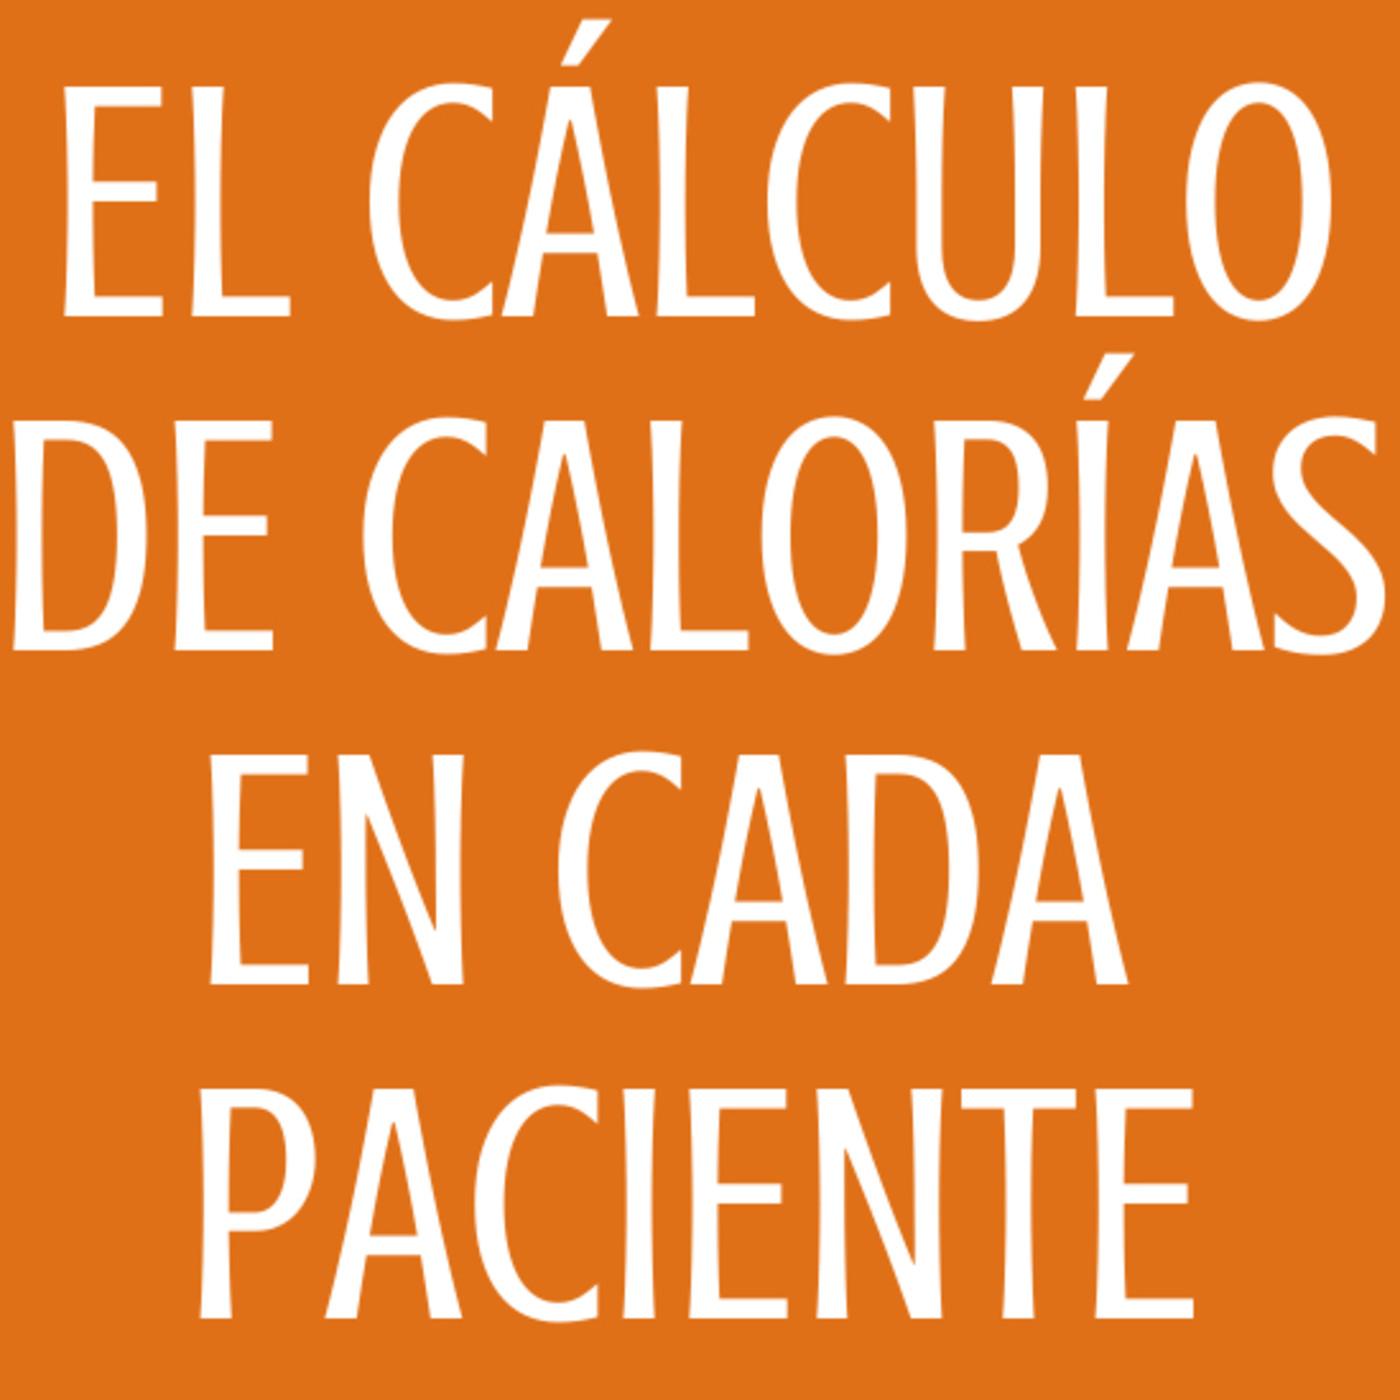 calorías necesito para bajar de peso